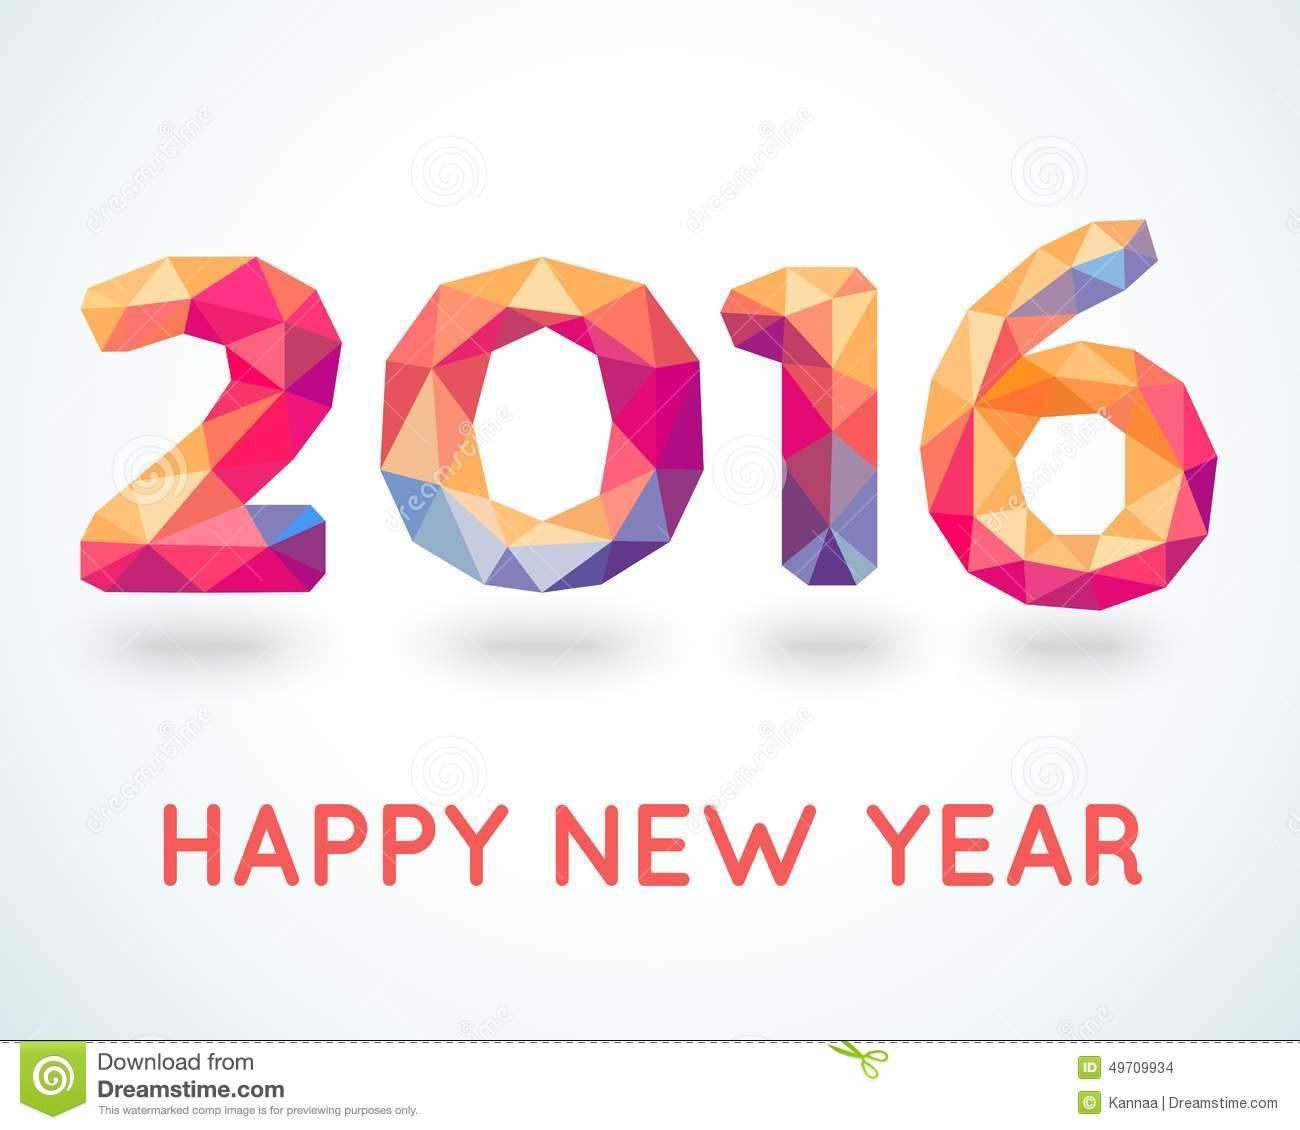 ������ 2016 ������� , ���� �������� ����� ������ , ������ ����� ������� 2016 new_1451402523_162.j